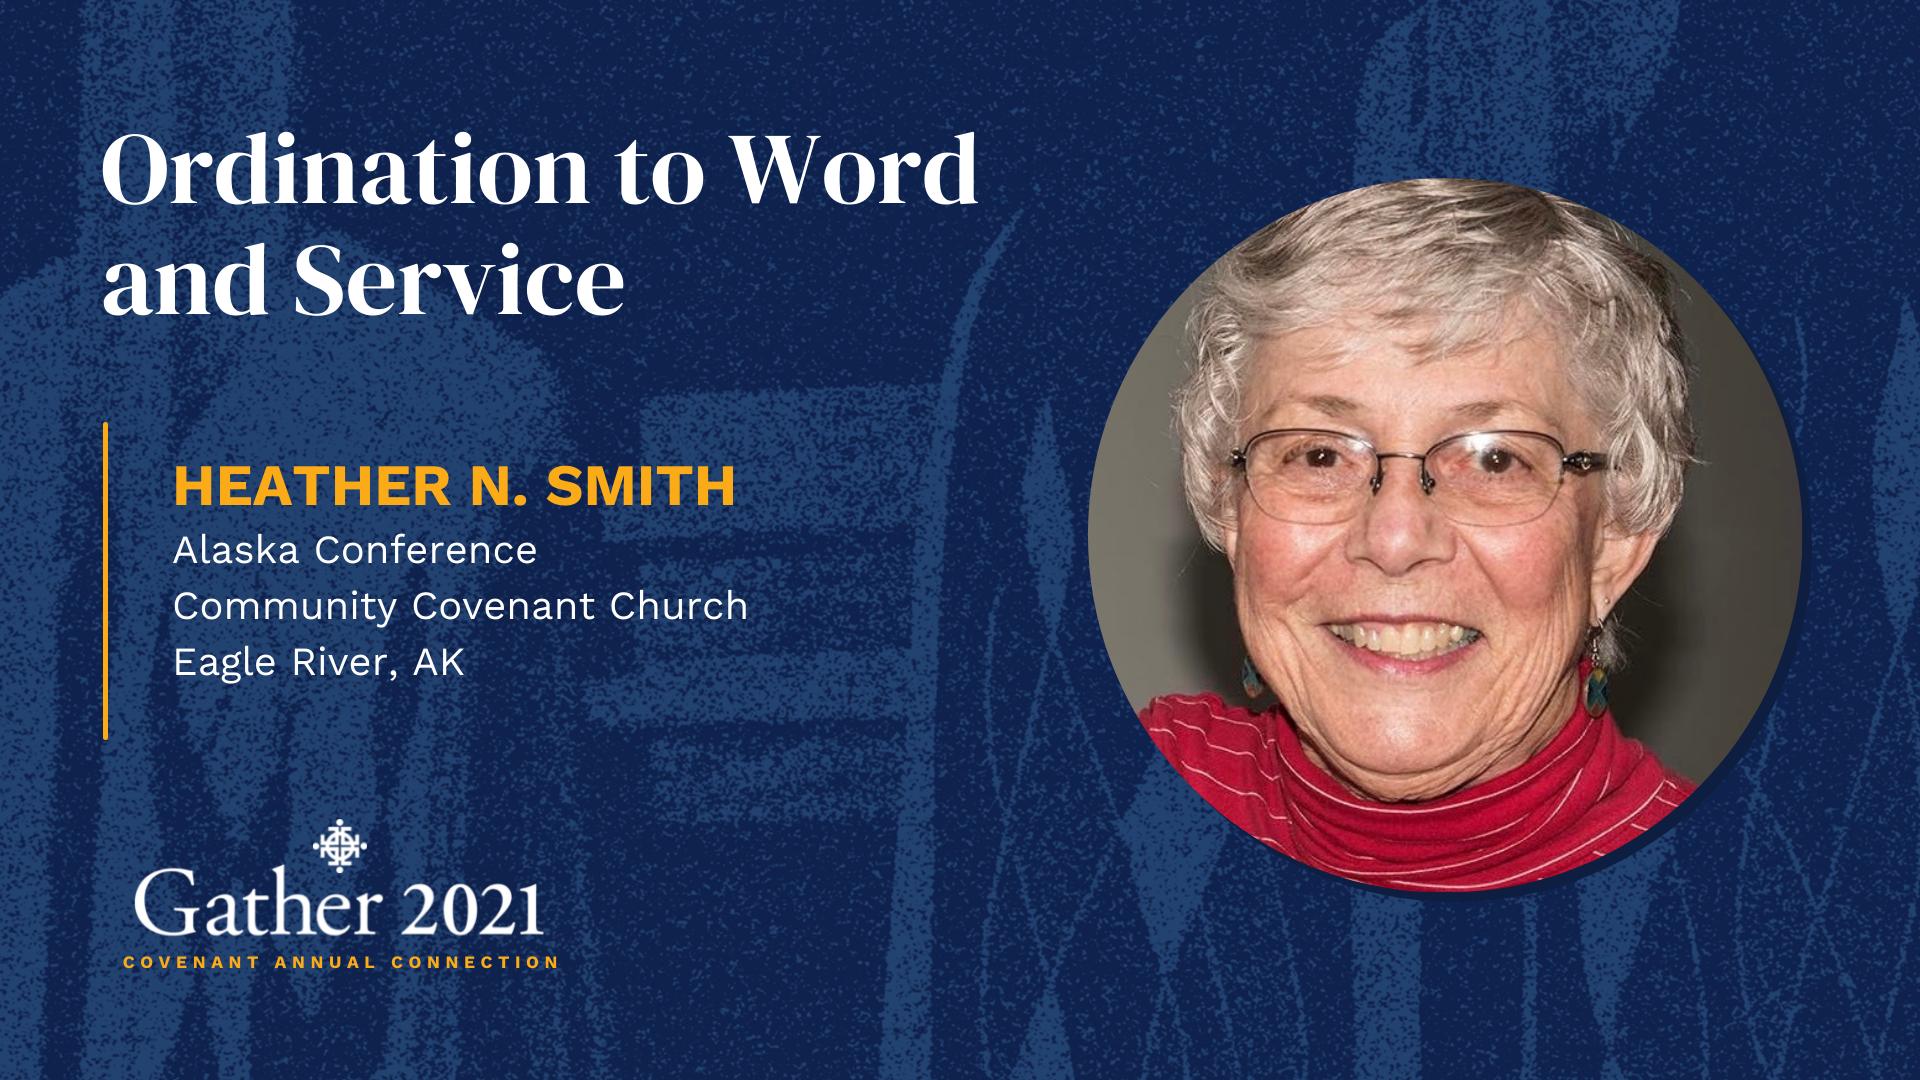 Heather N. Smith